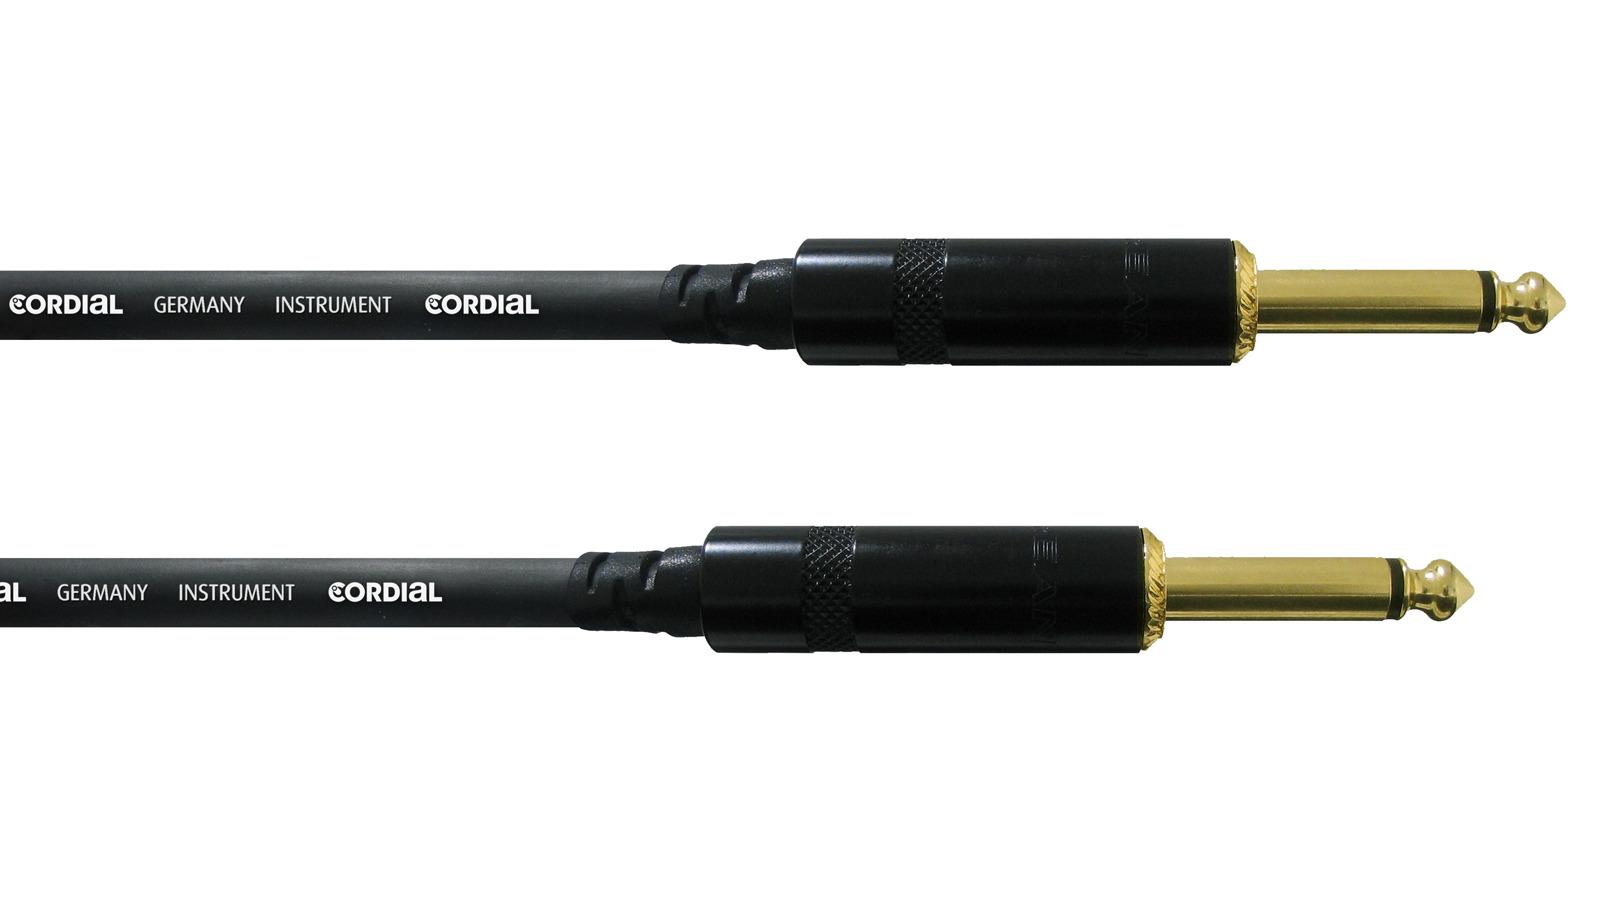 Cordial CCI 9 PP Instrumentenkabel 9 m